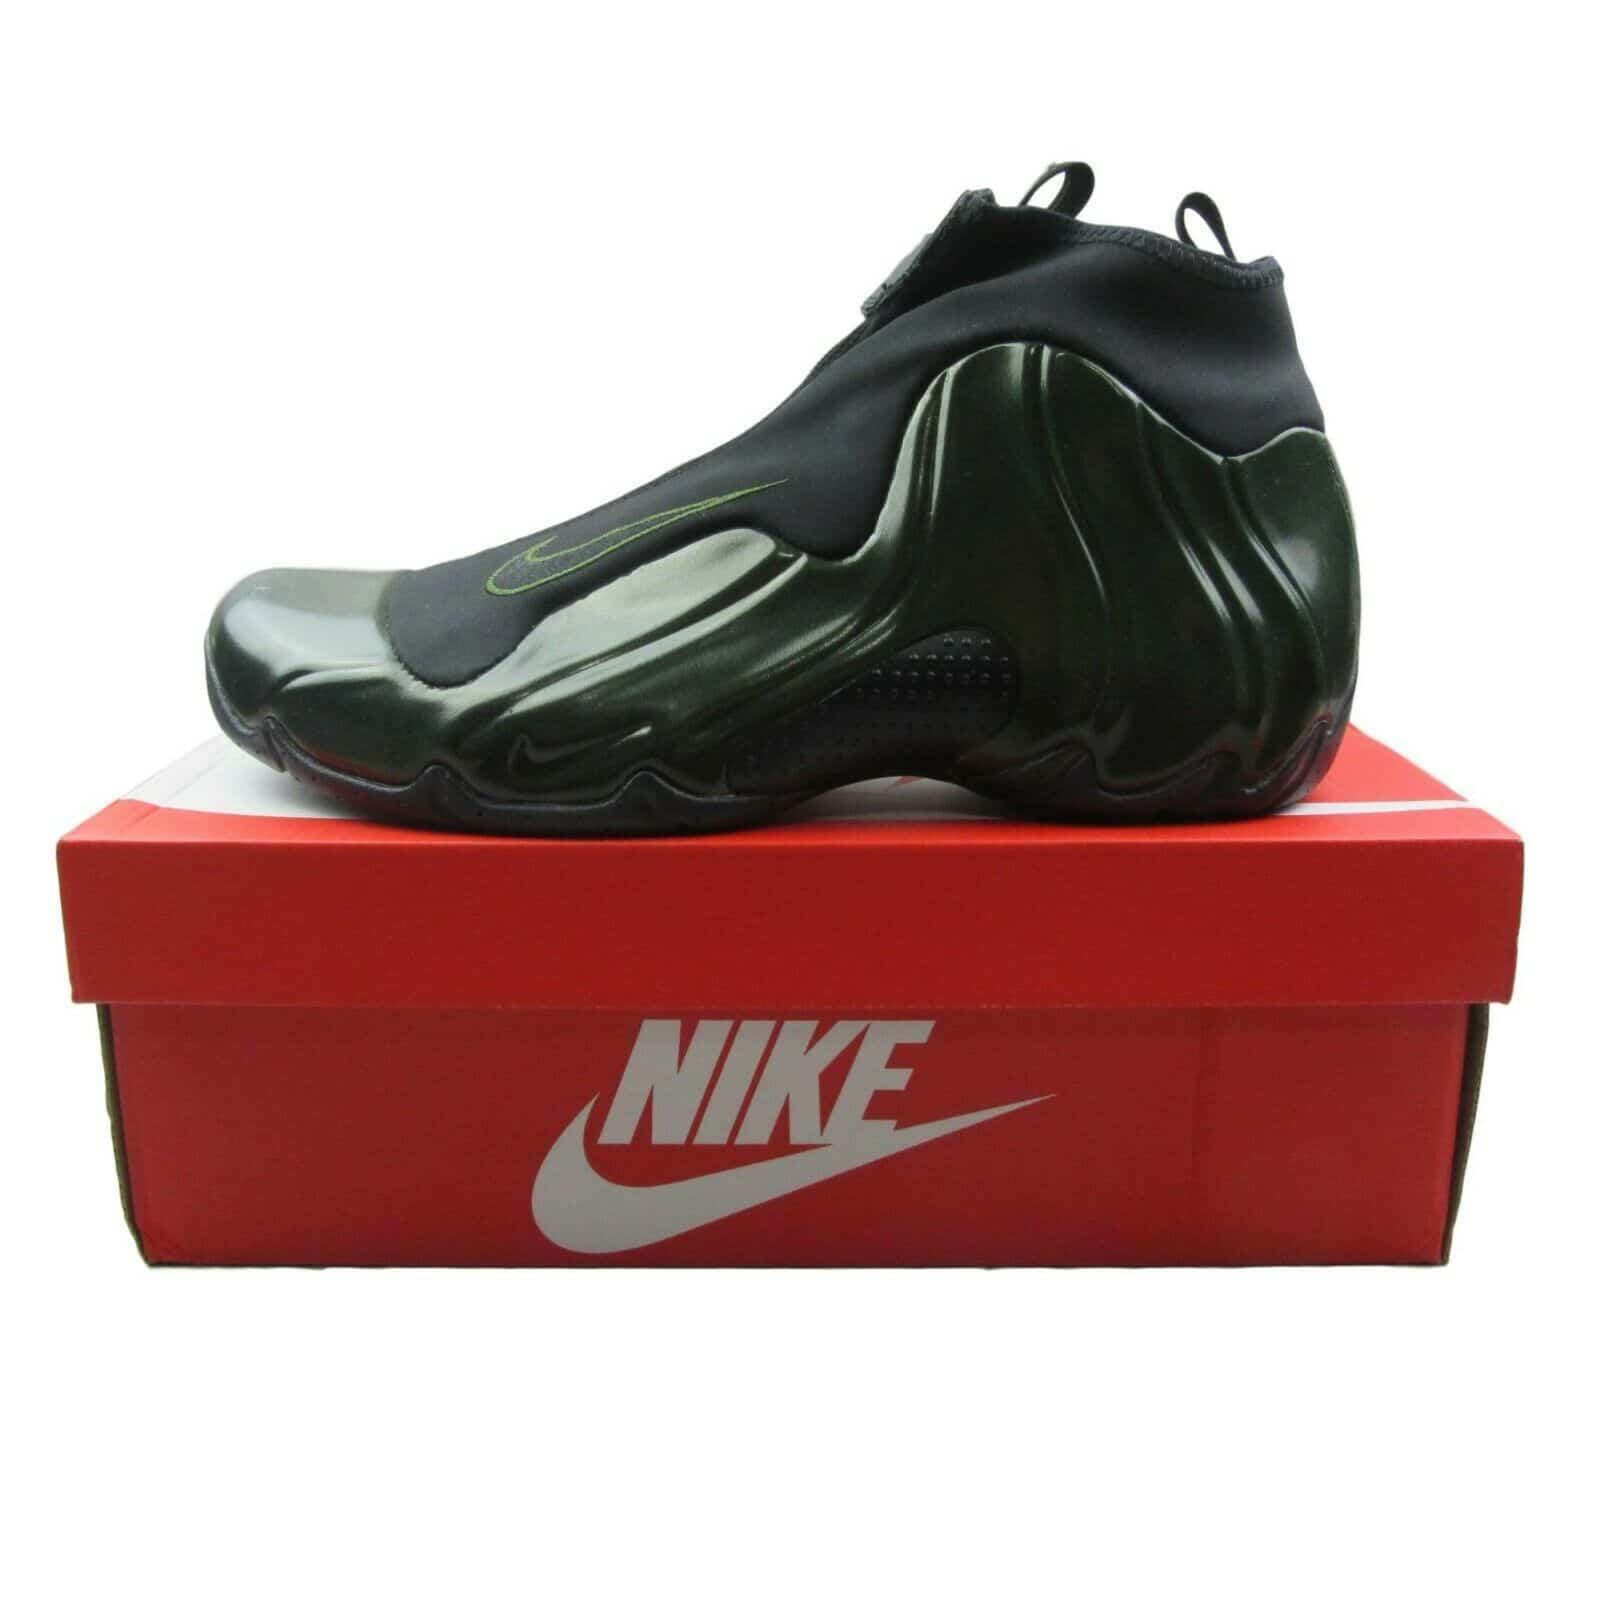 81edd6122dce Nike Air Flightposite Legion Green 2018 Basketball Shoes AO9378 300 ...